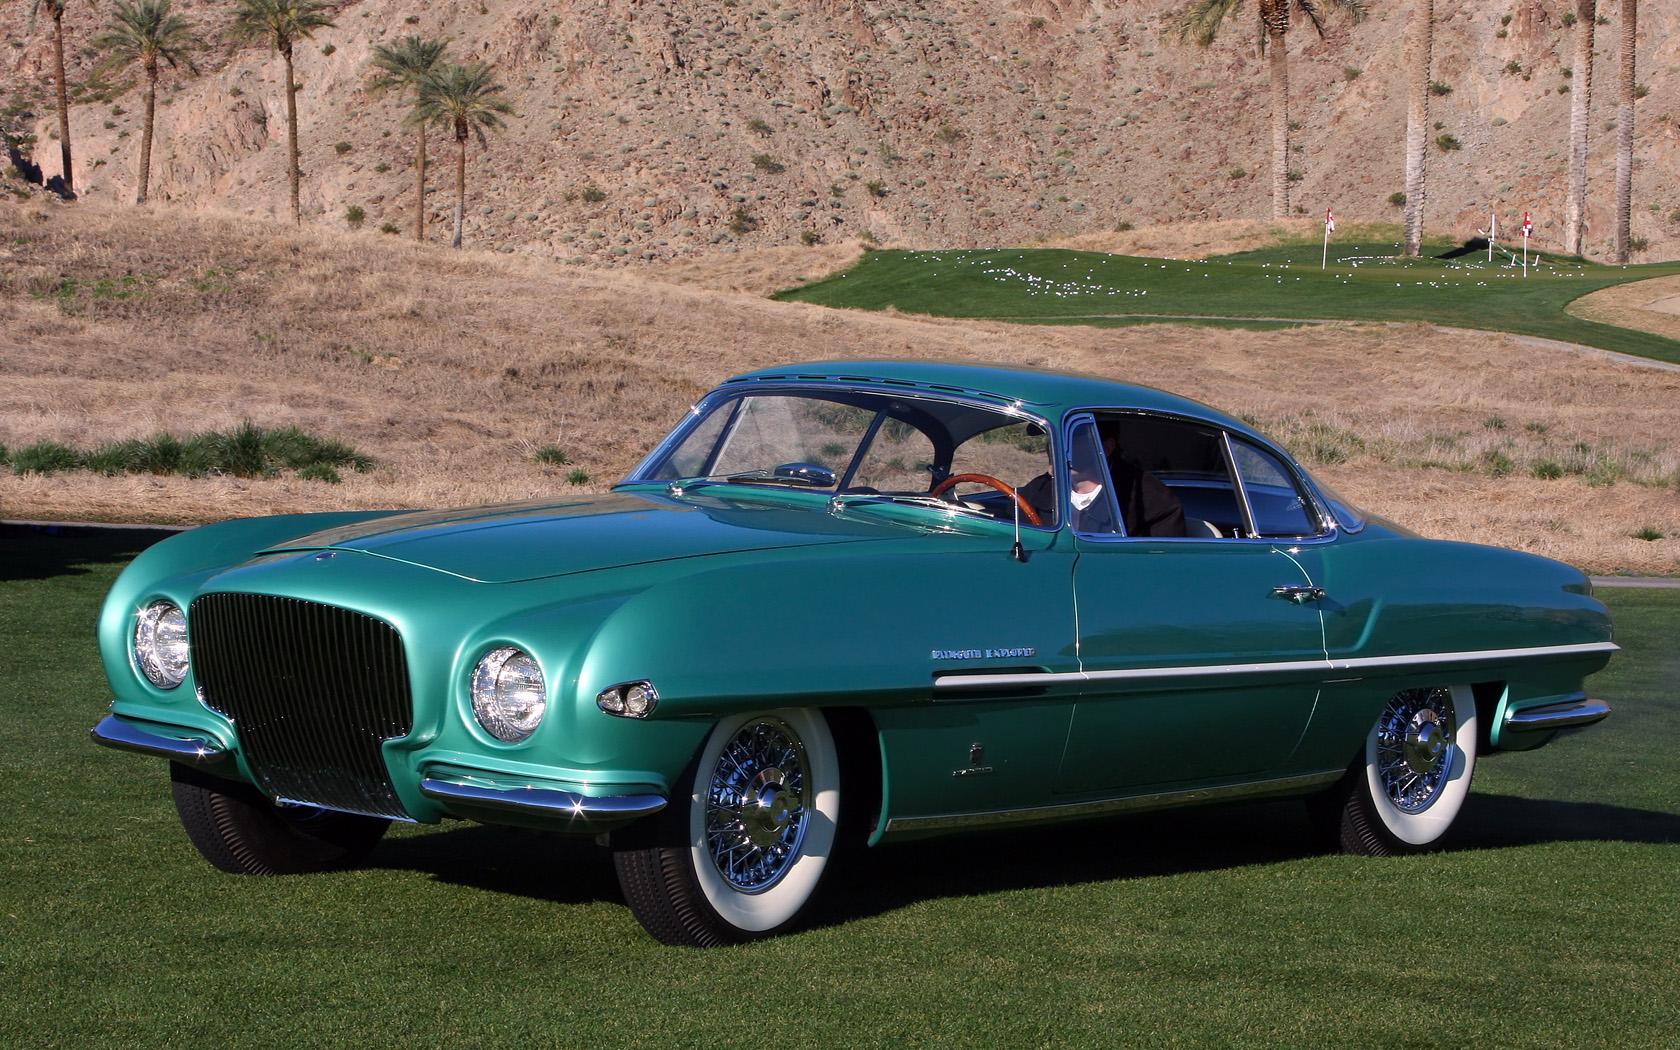 Plymouth Explorer Special (Ghia), 1954